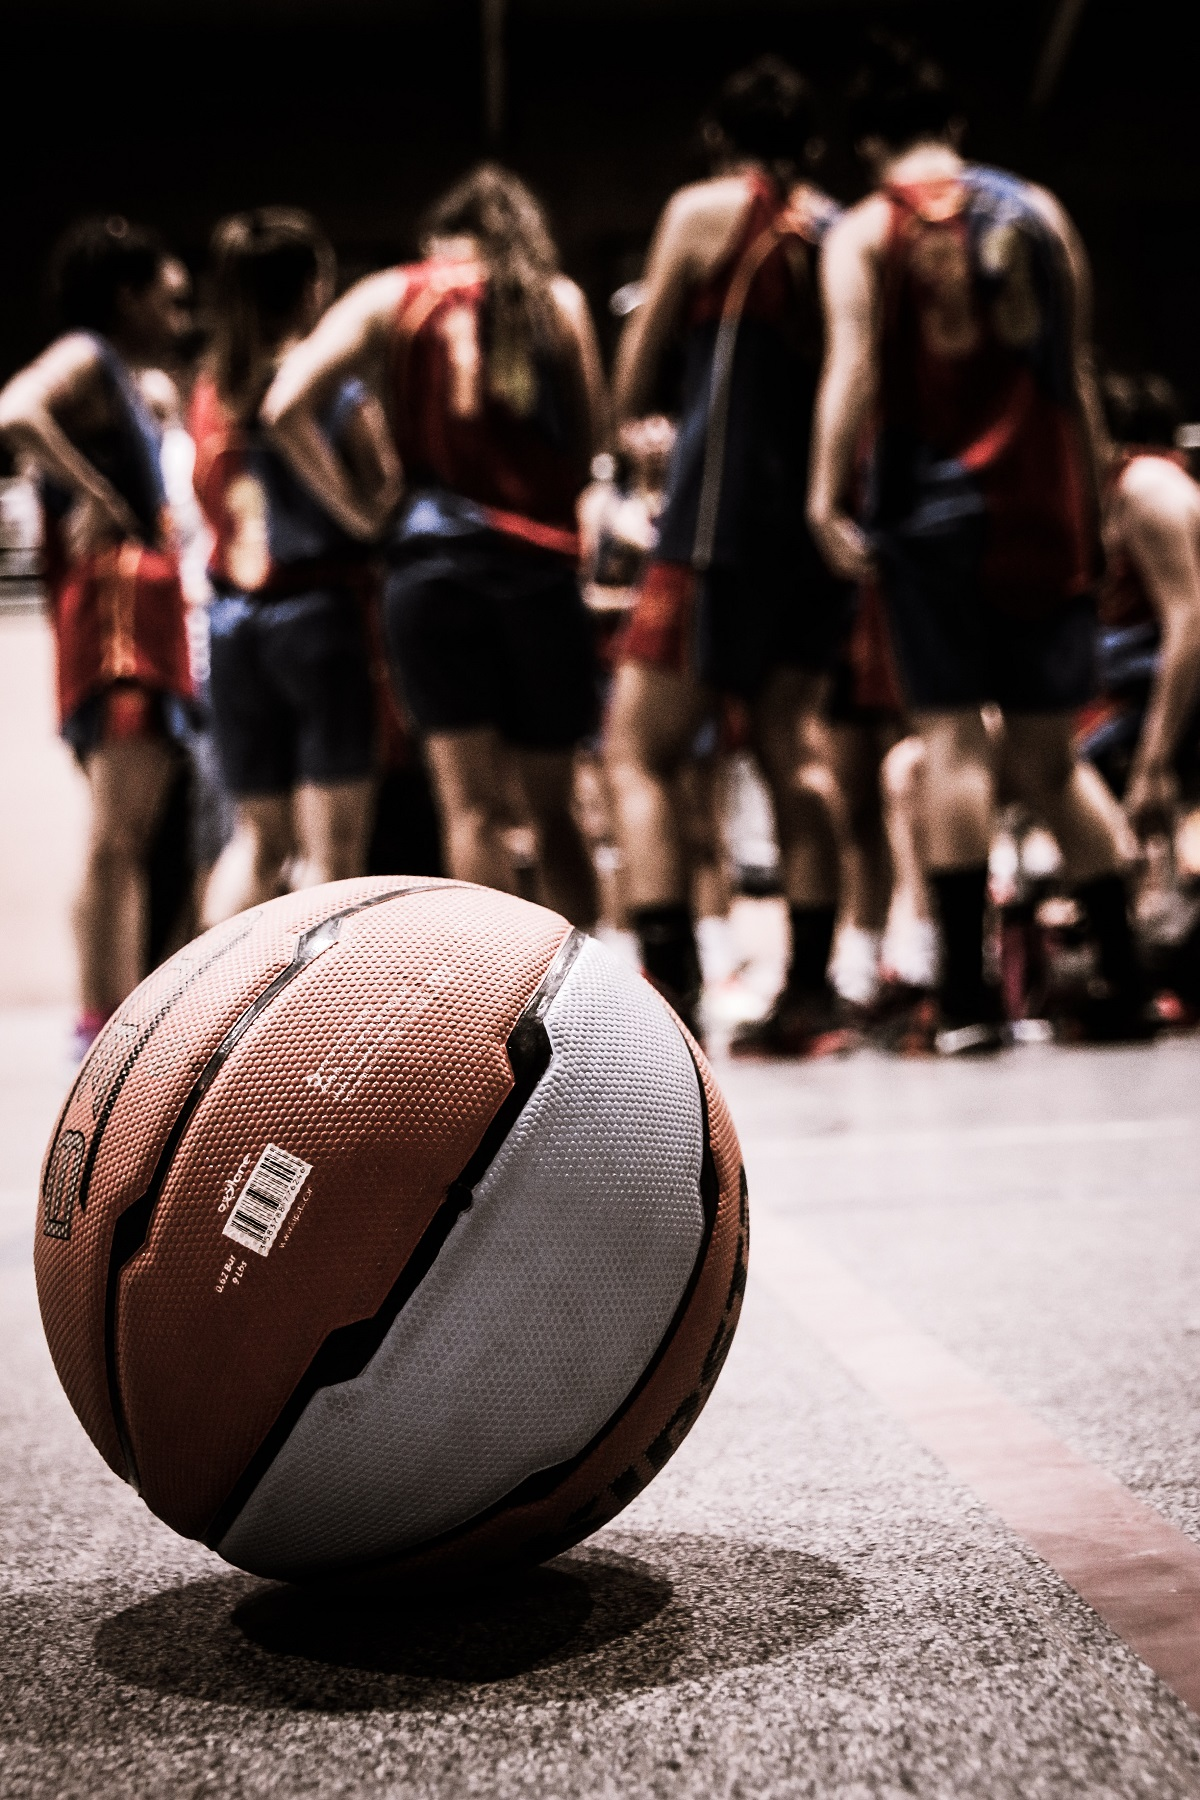 A basketball team.